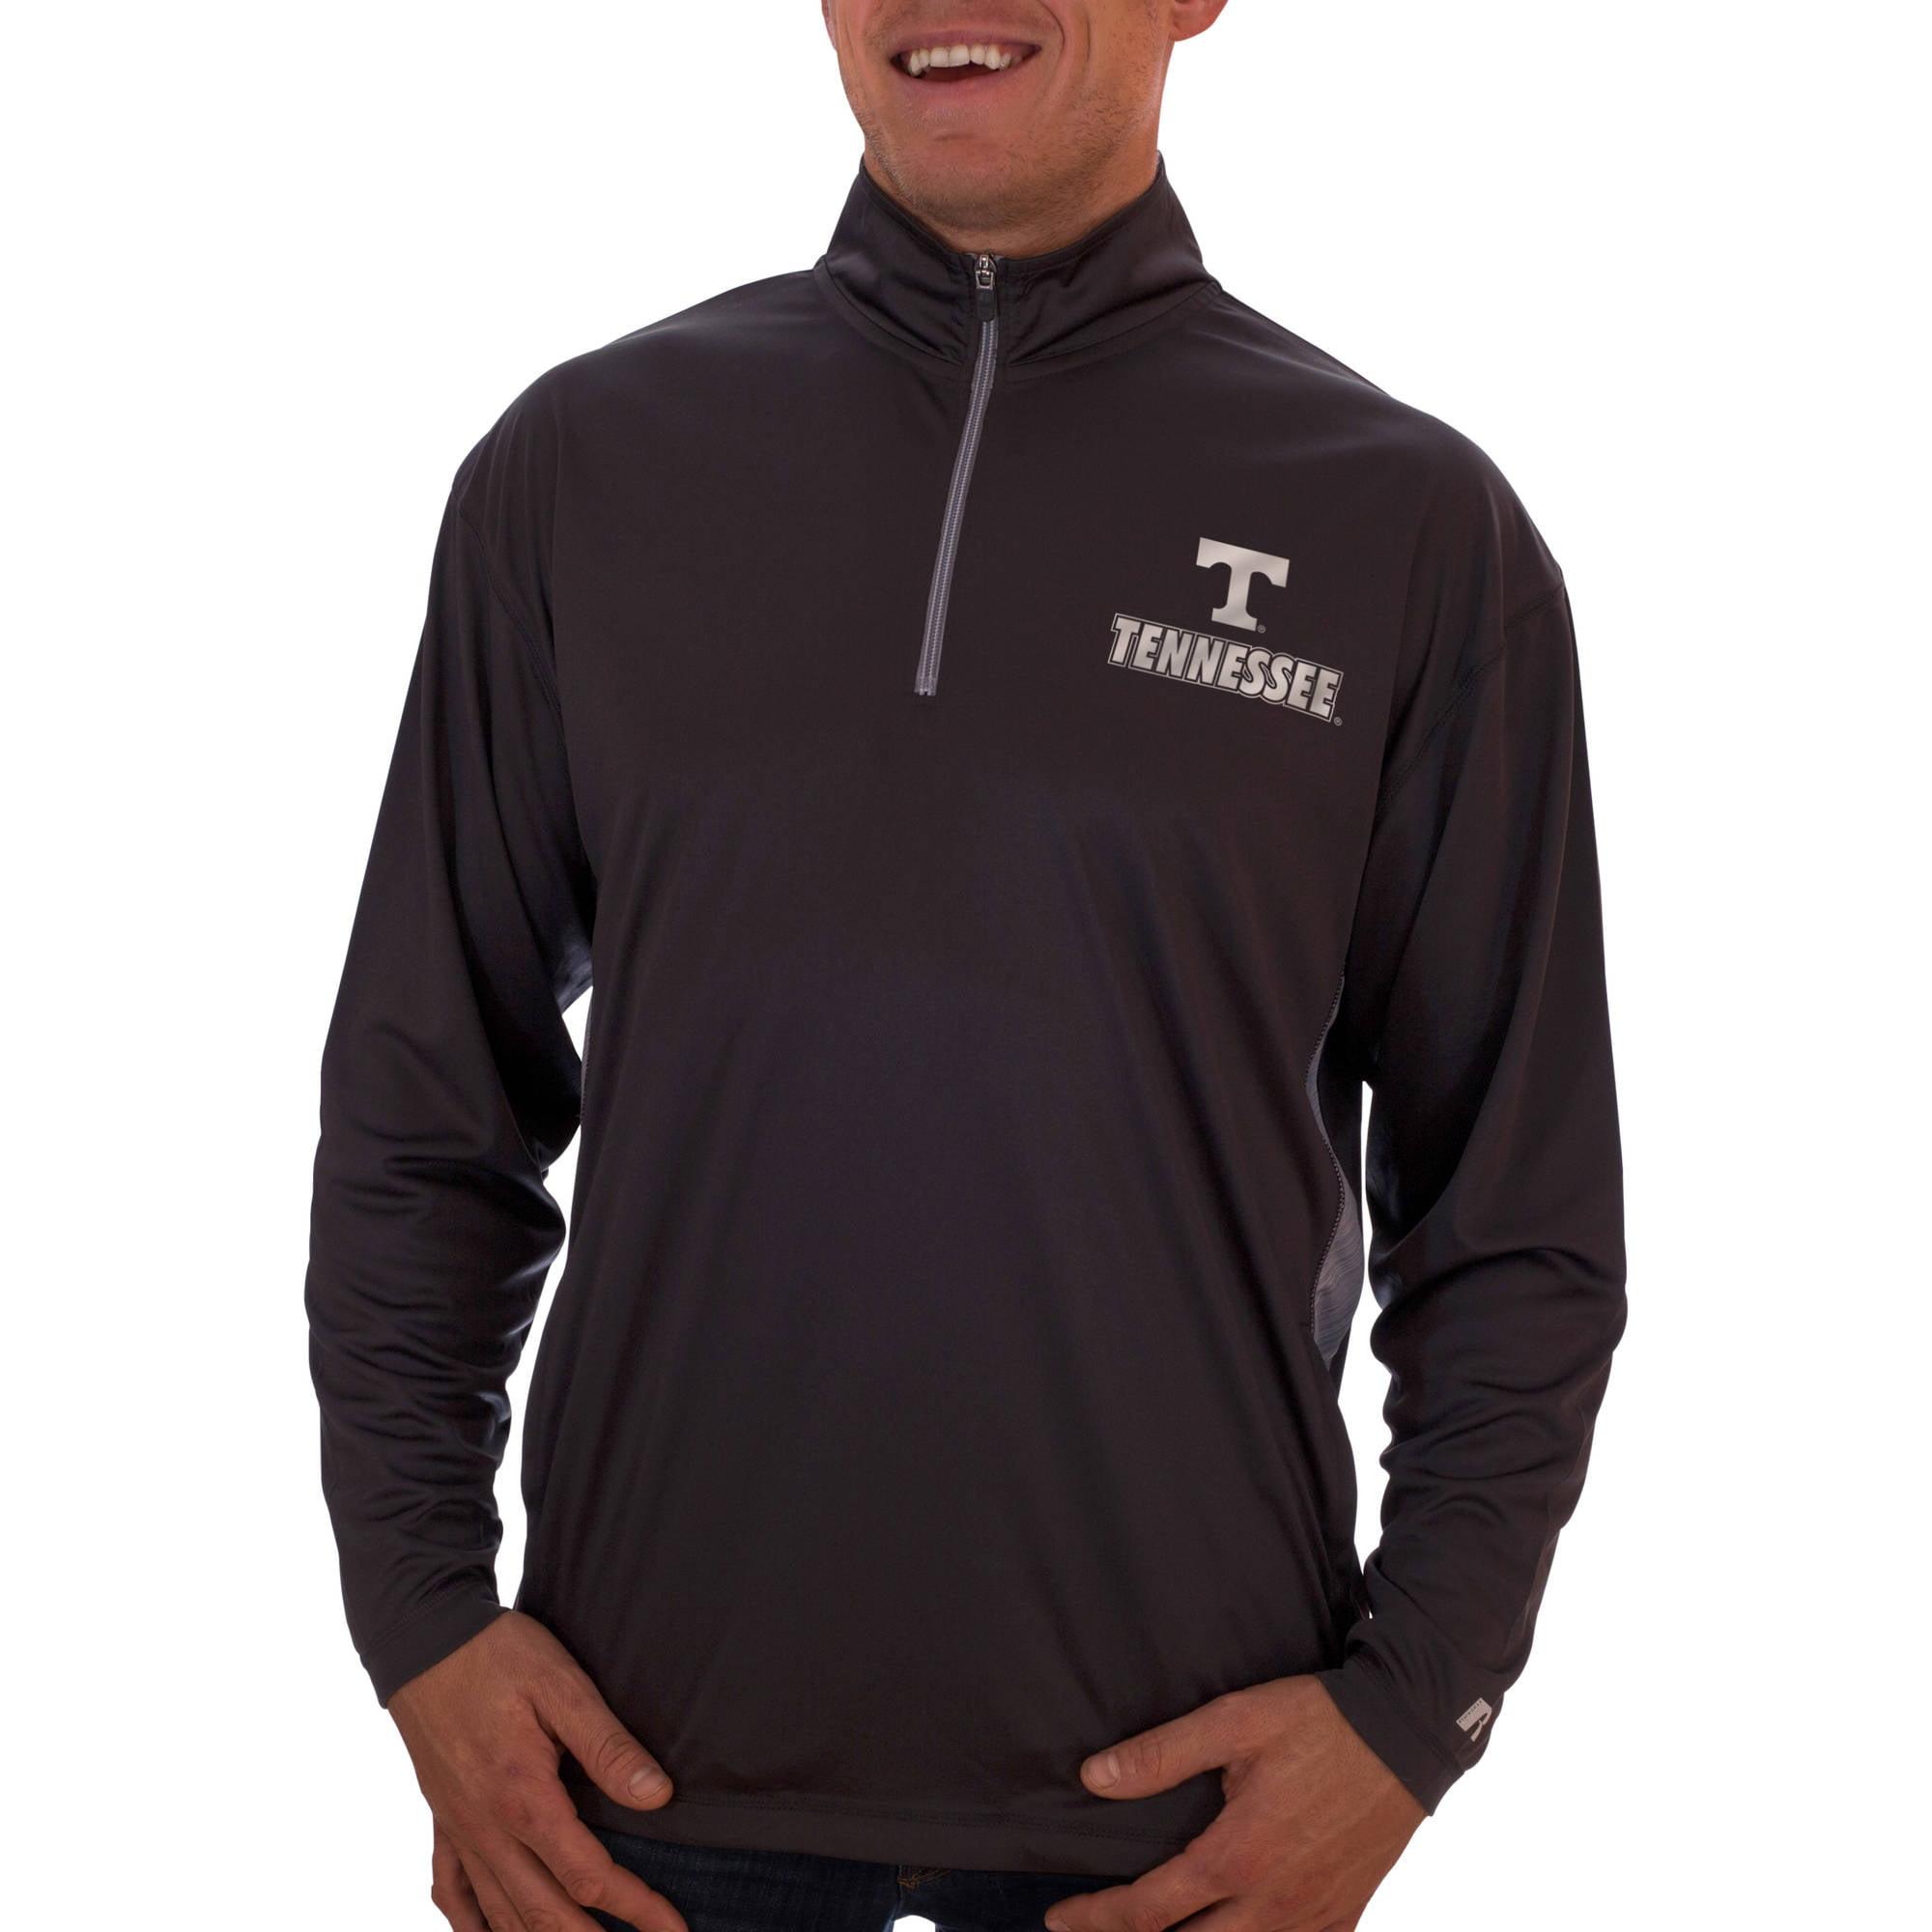 Russell NCAA Tennessee Volunteers Big Men's Athletic Fit Black/ Storm Gray 1/4-Zip Fitness Jacket